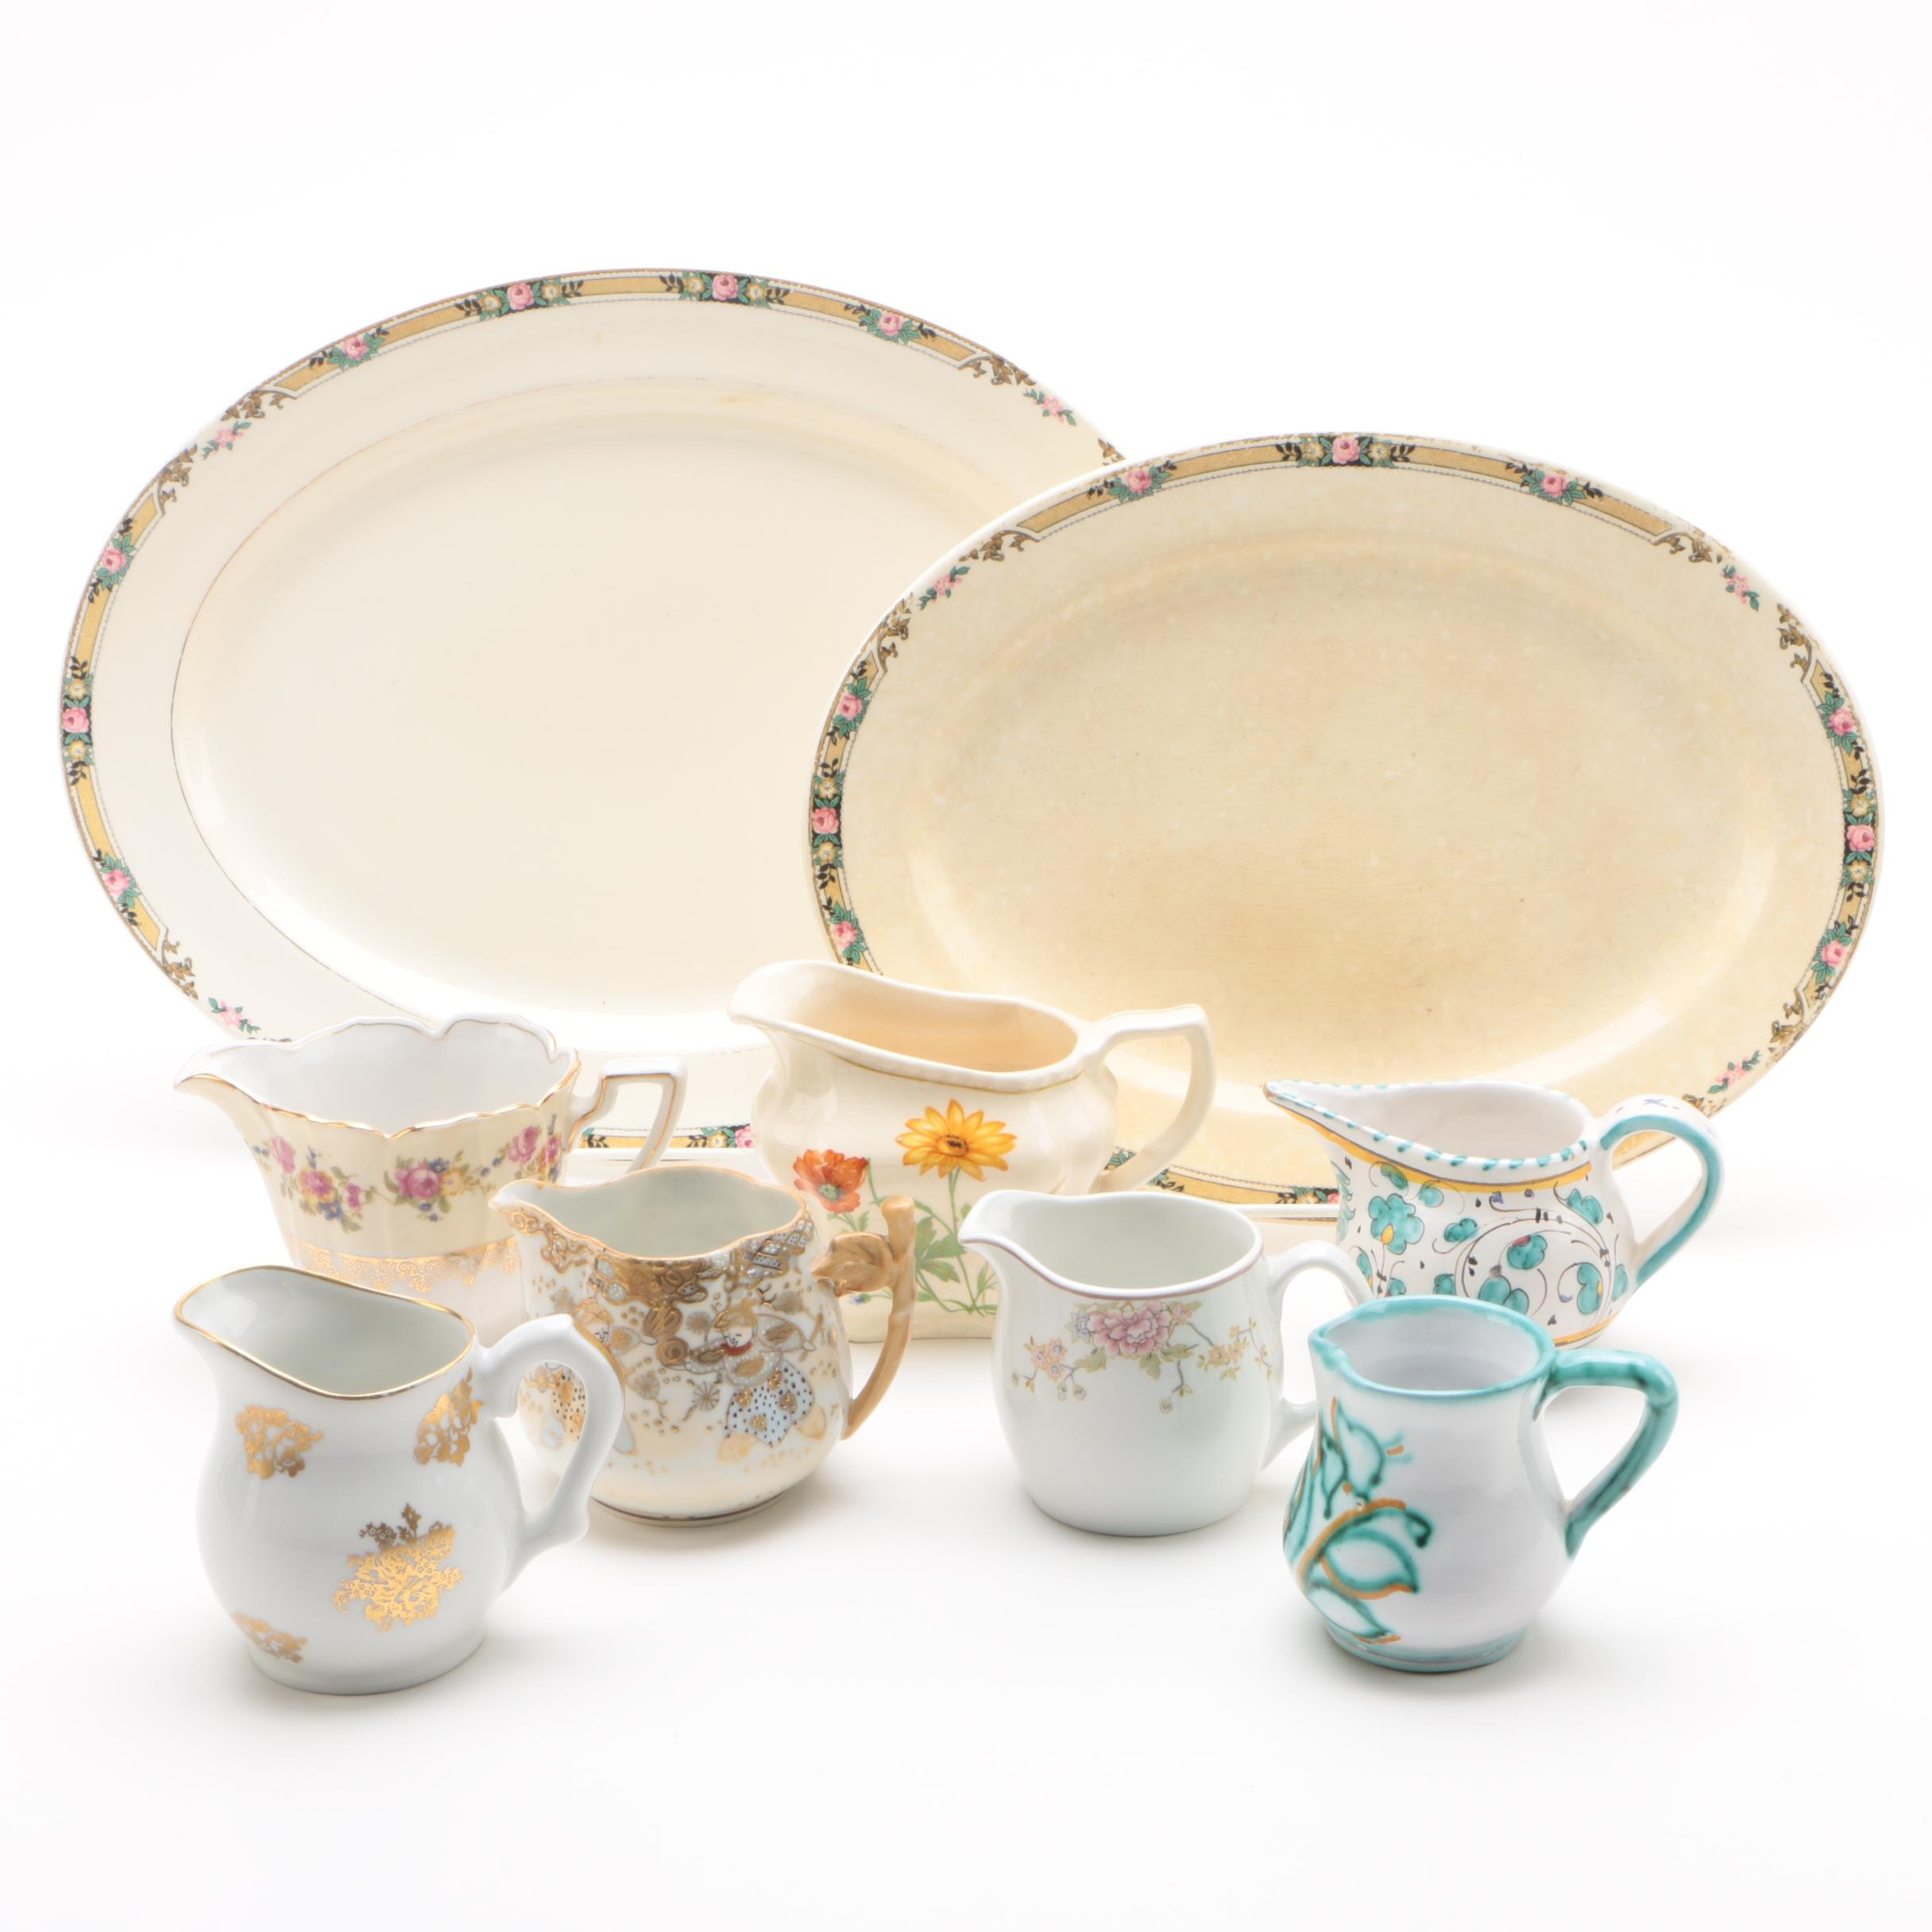 Mount Clemens Porcelain Platters and Vintage Creamer Jugs Featuring Steubenville